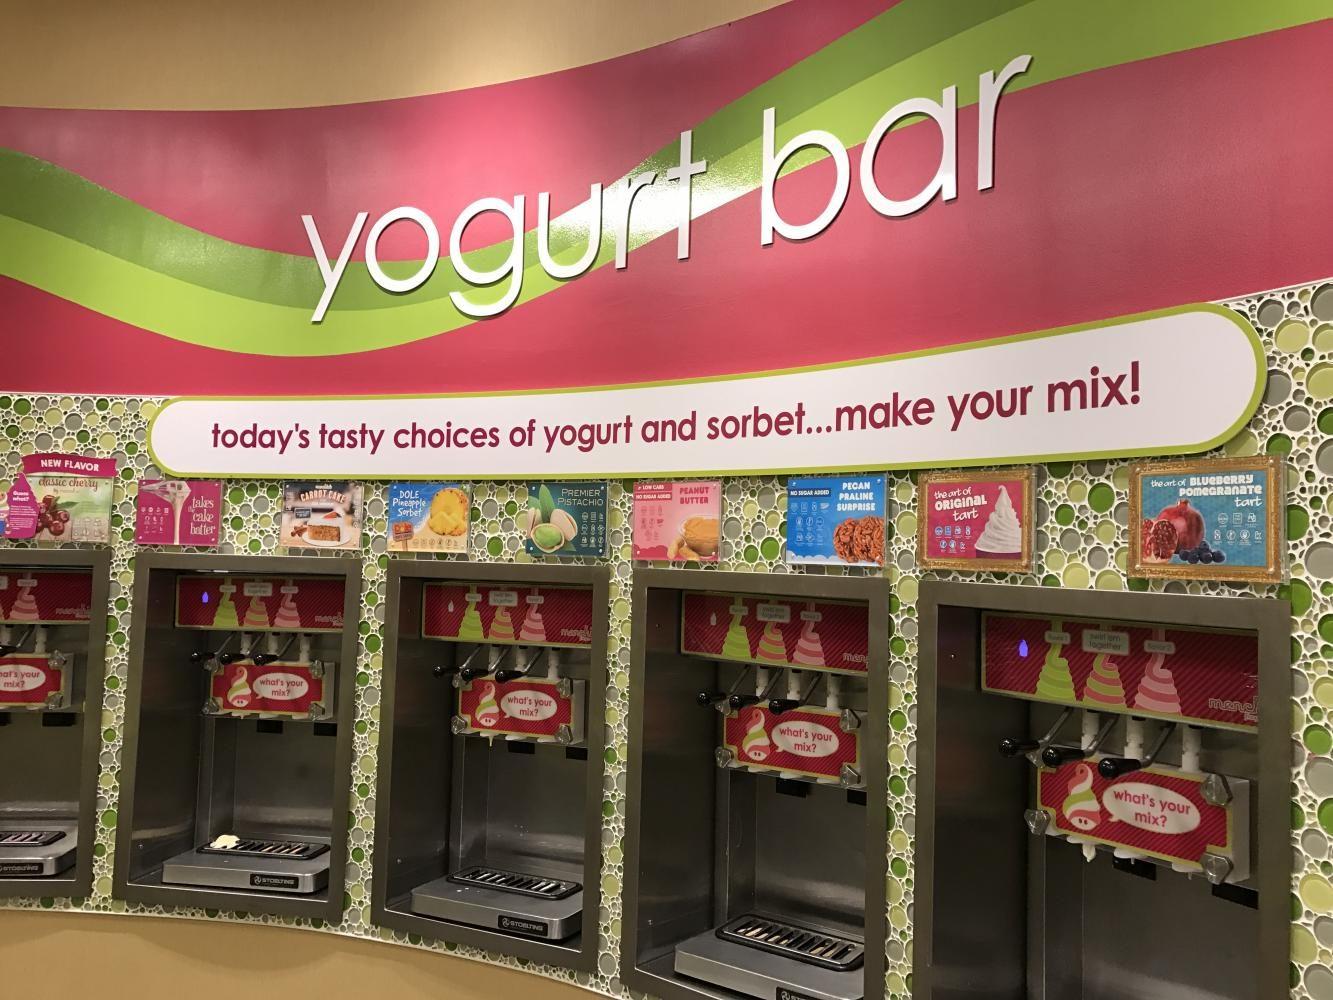 The yogurt bar with more than ten flavors.